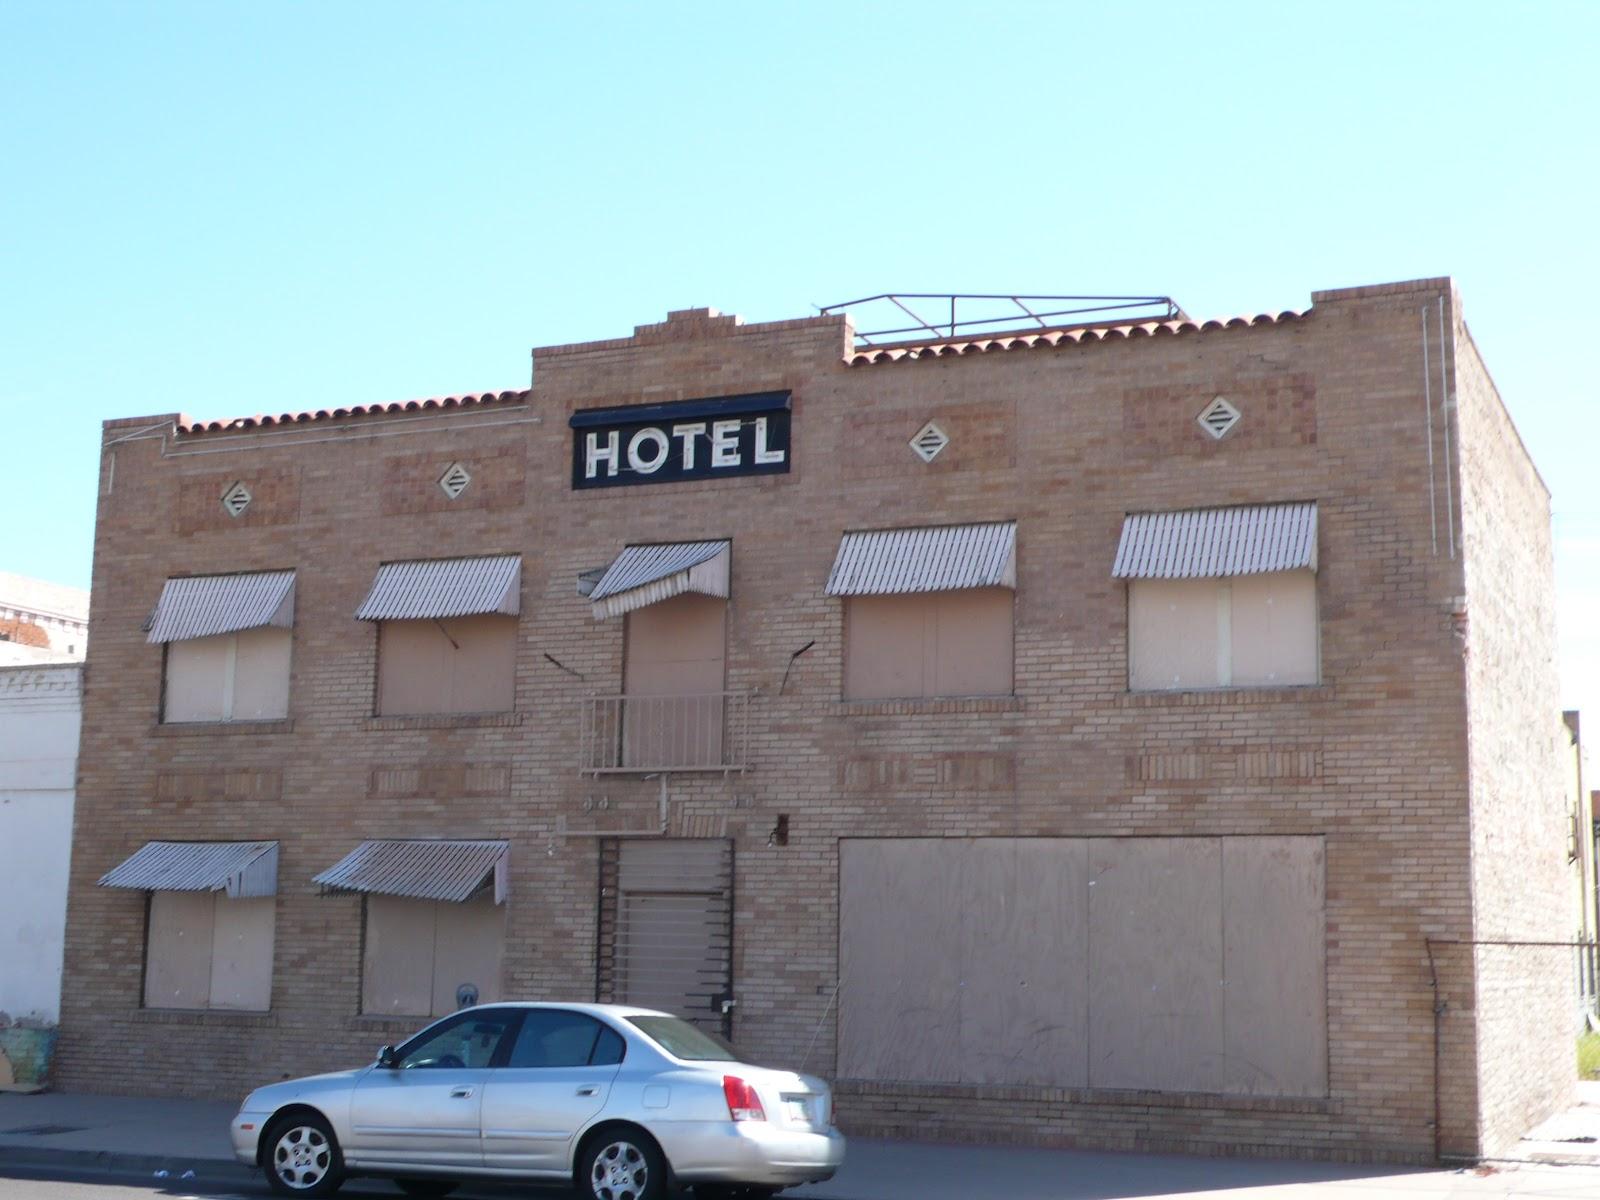 Phoenix Single Room Occupancy Hotels